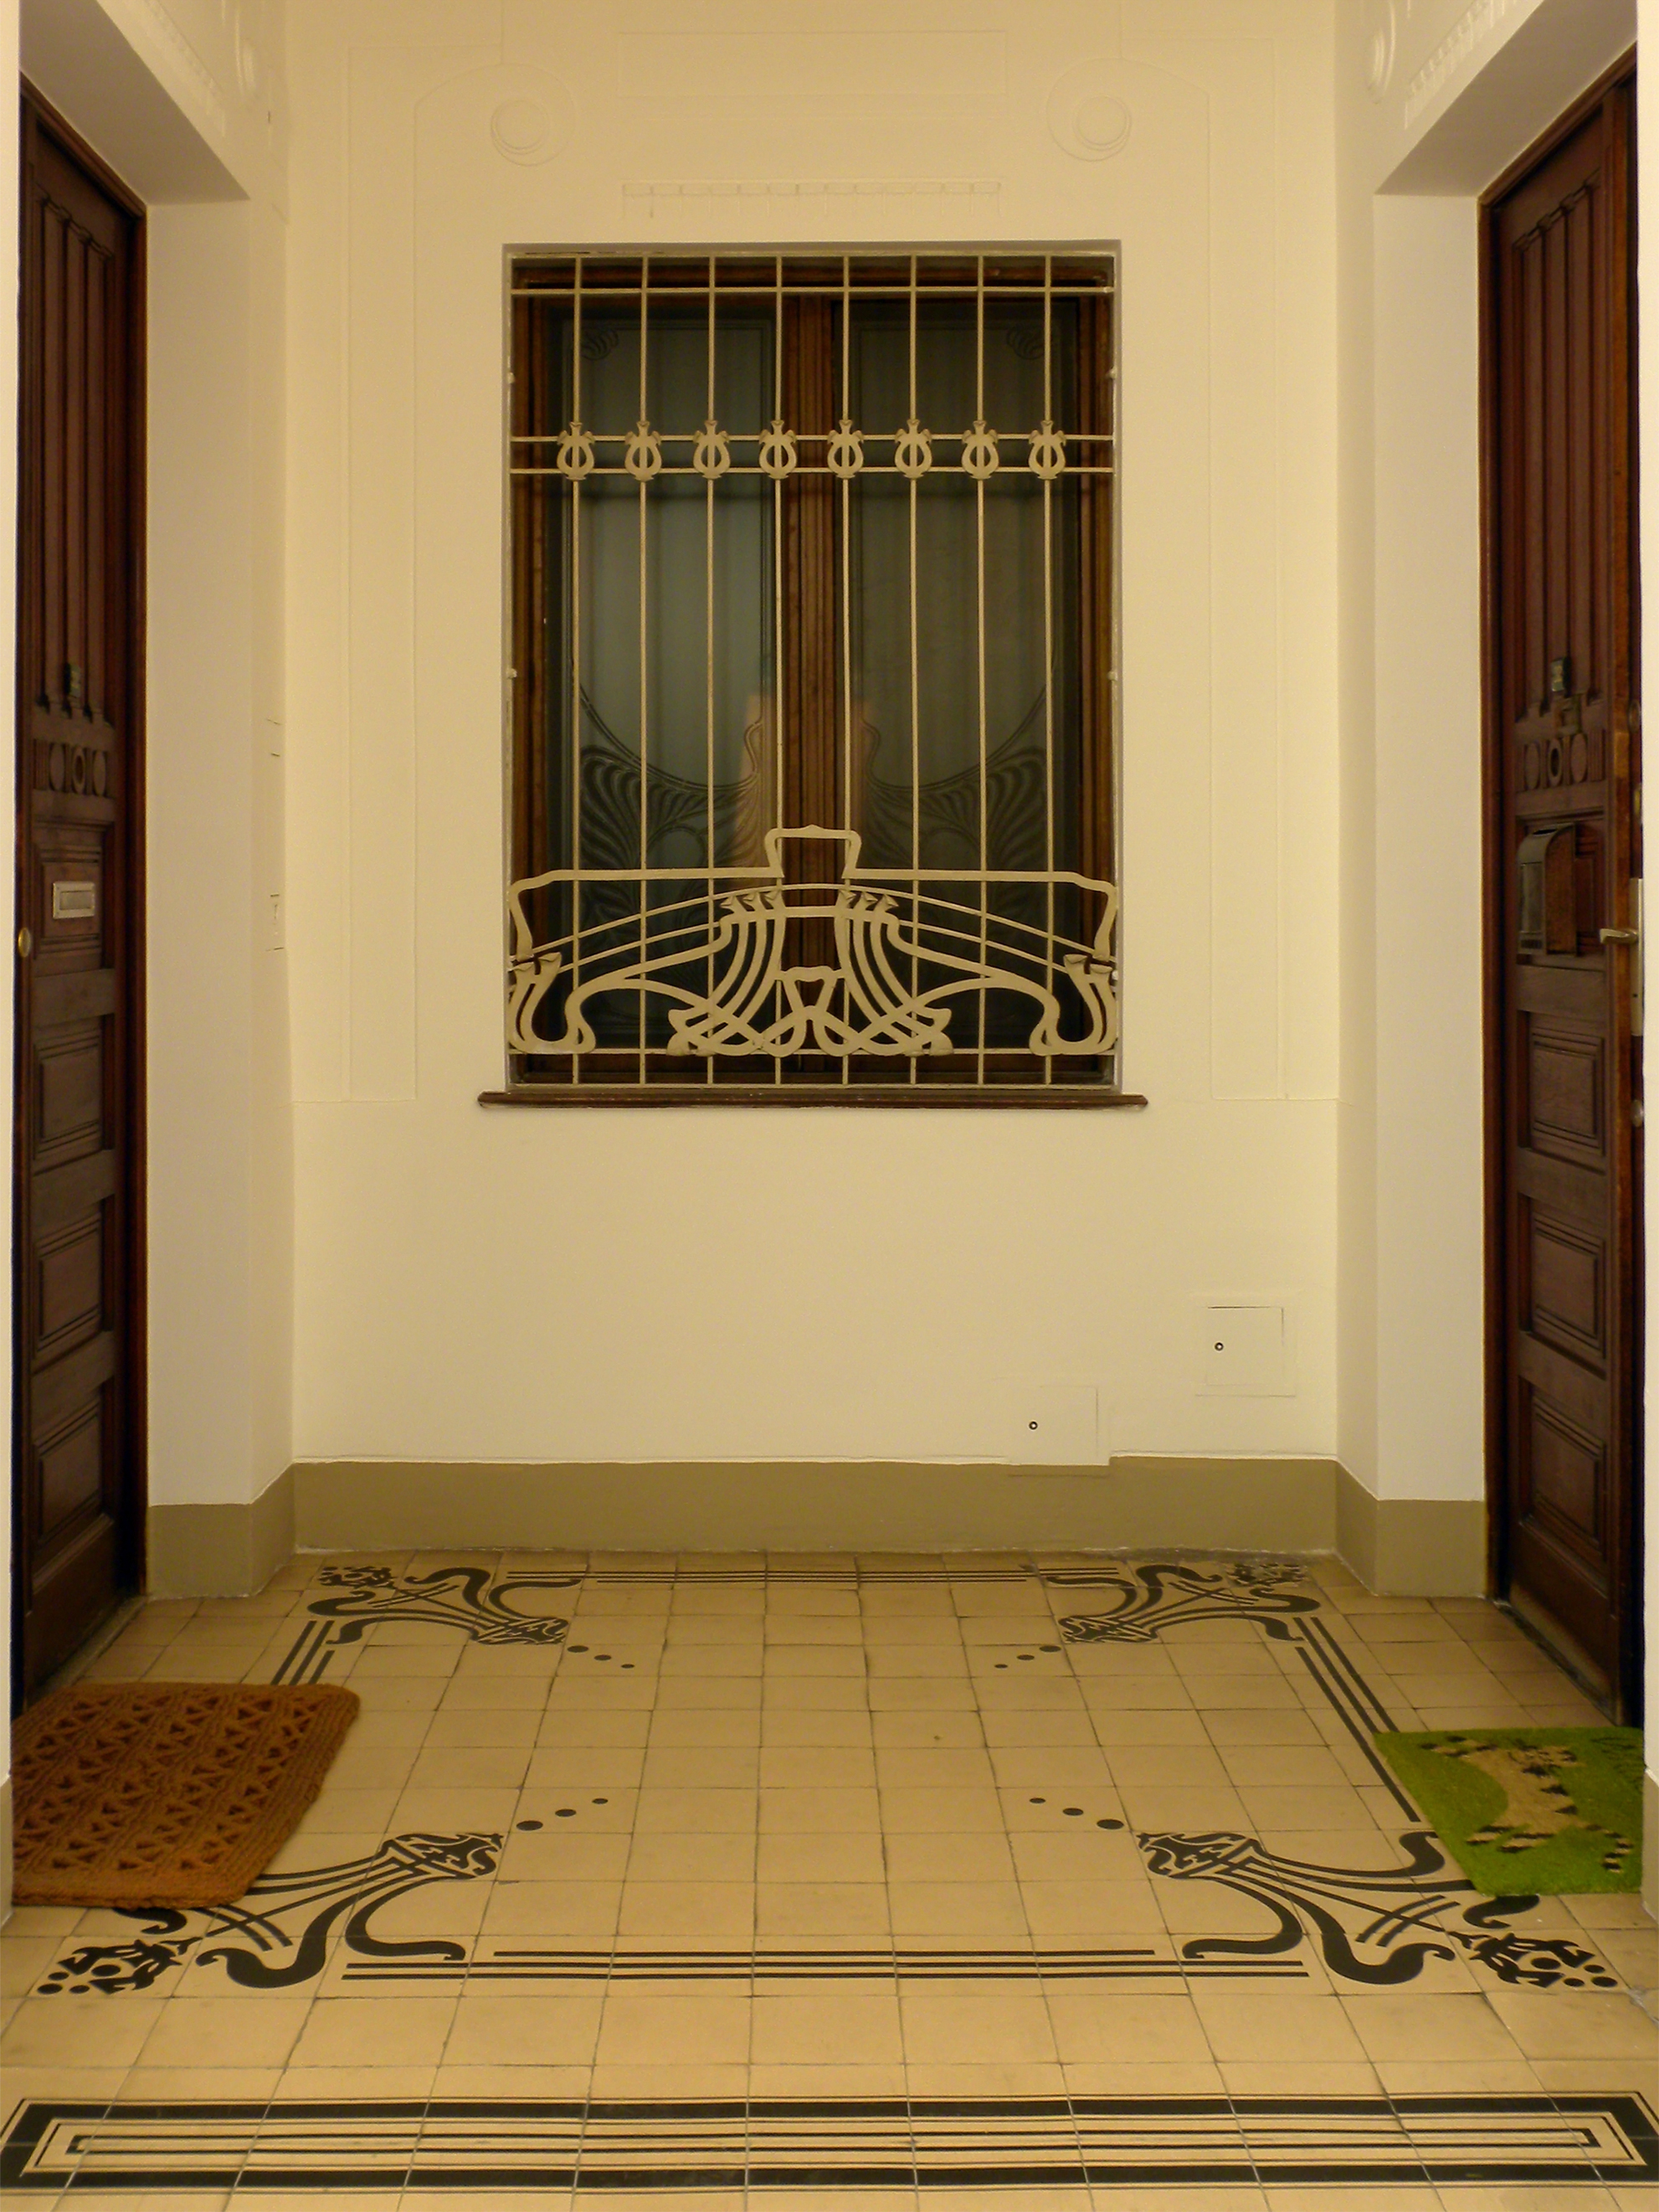 file wien majolikahaus fliesen und fenster im wikimedia commons. Black Bedroom Furniture Sets. Home Design Ideas